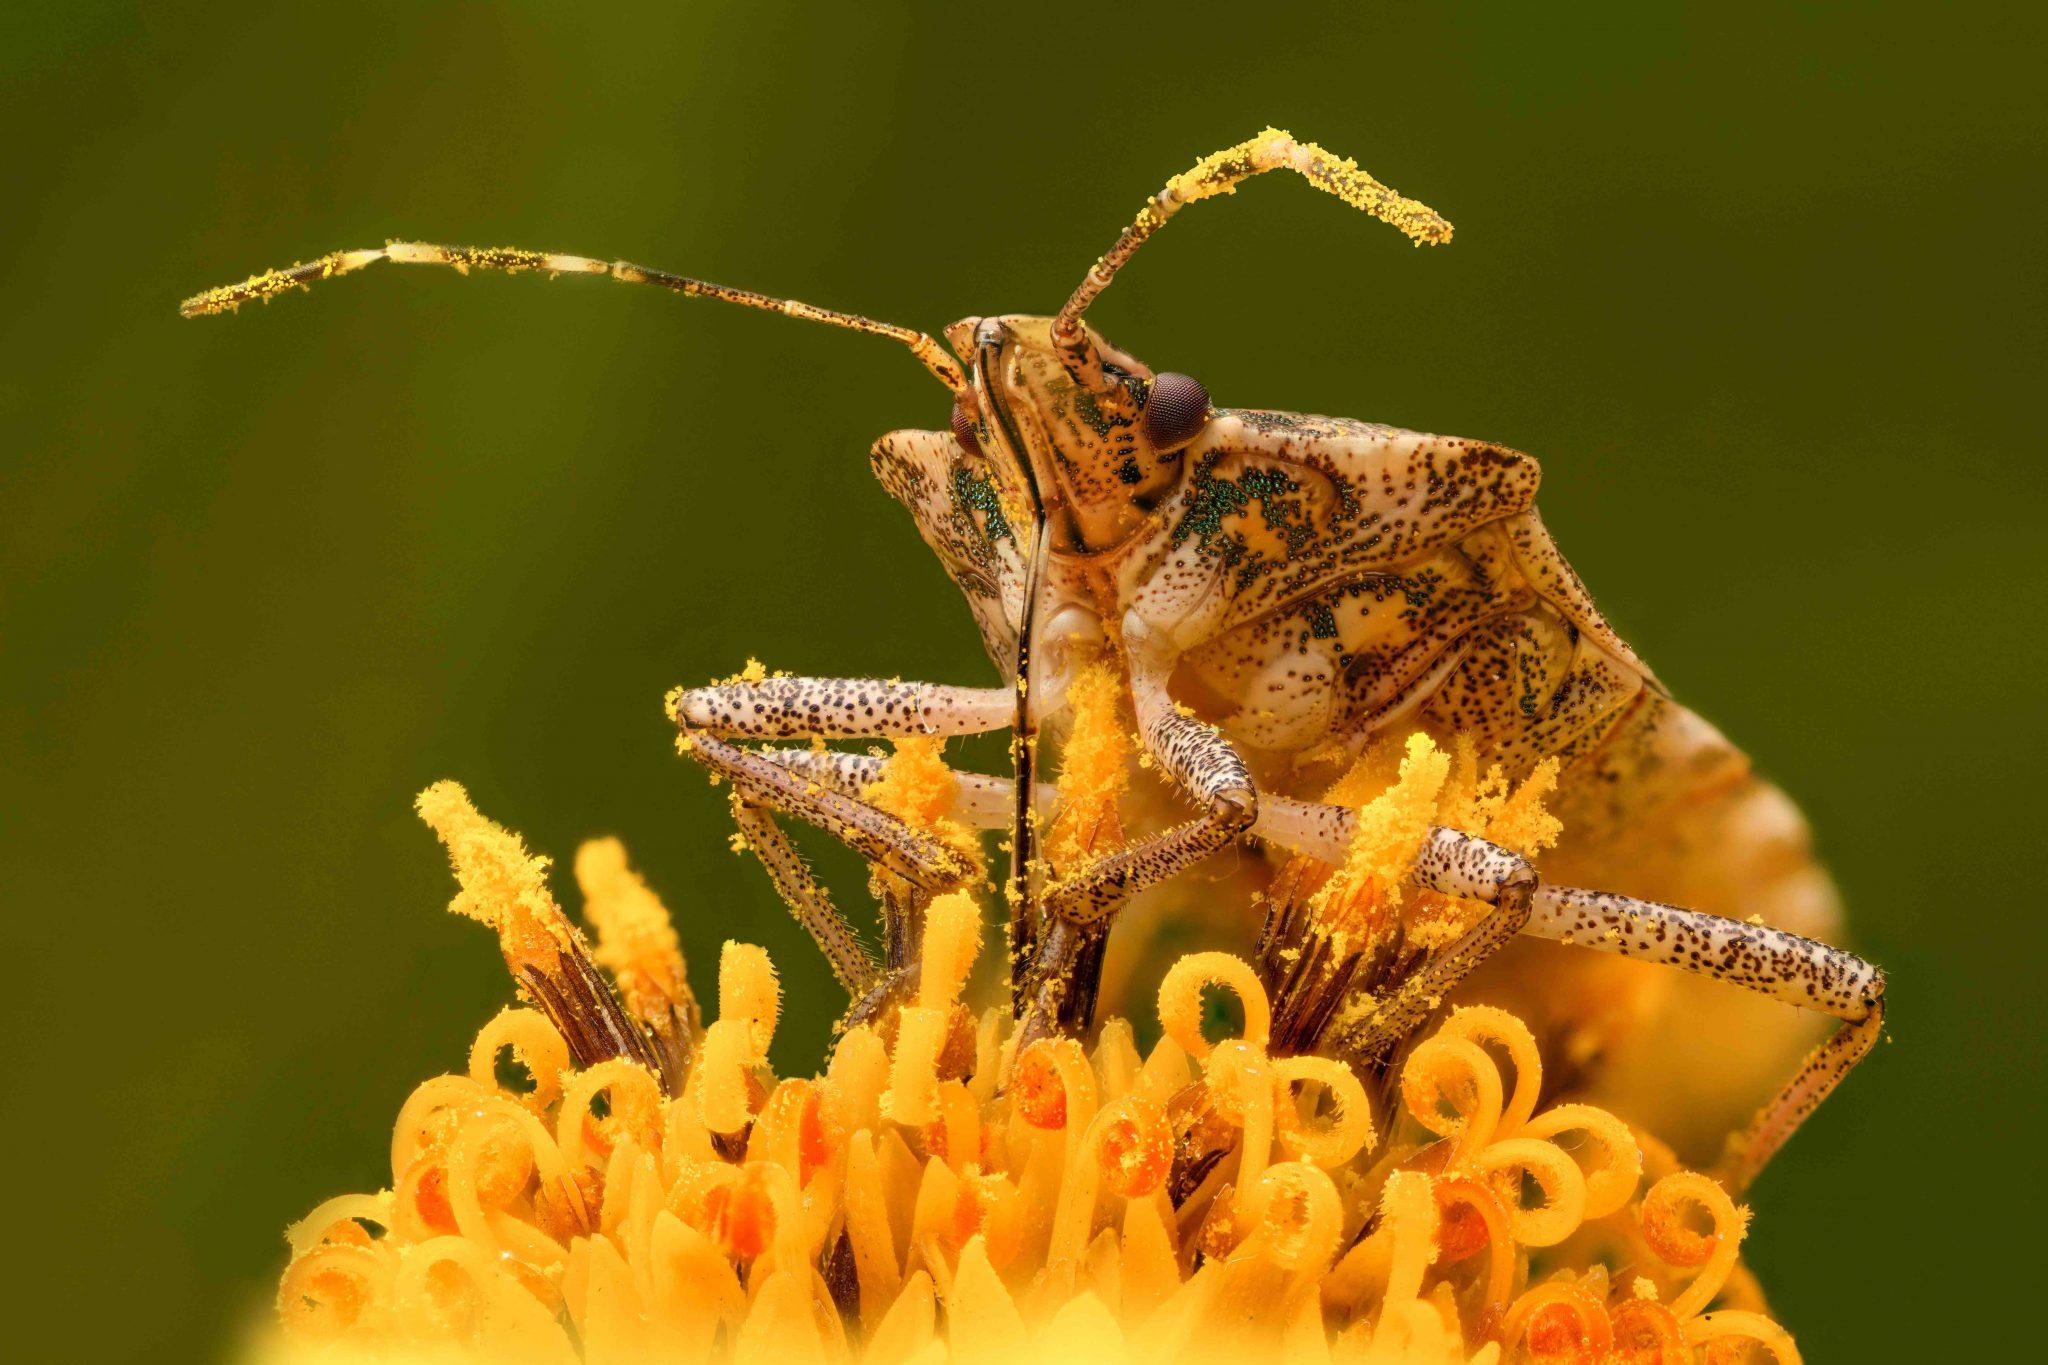 Pest Control Tips in Kelowna: Yard Maintenance Tips that Keep Pests Away